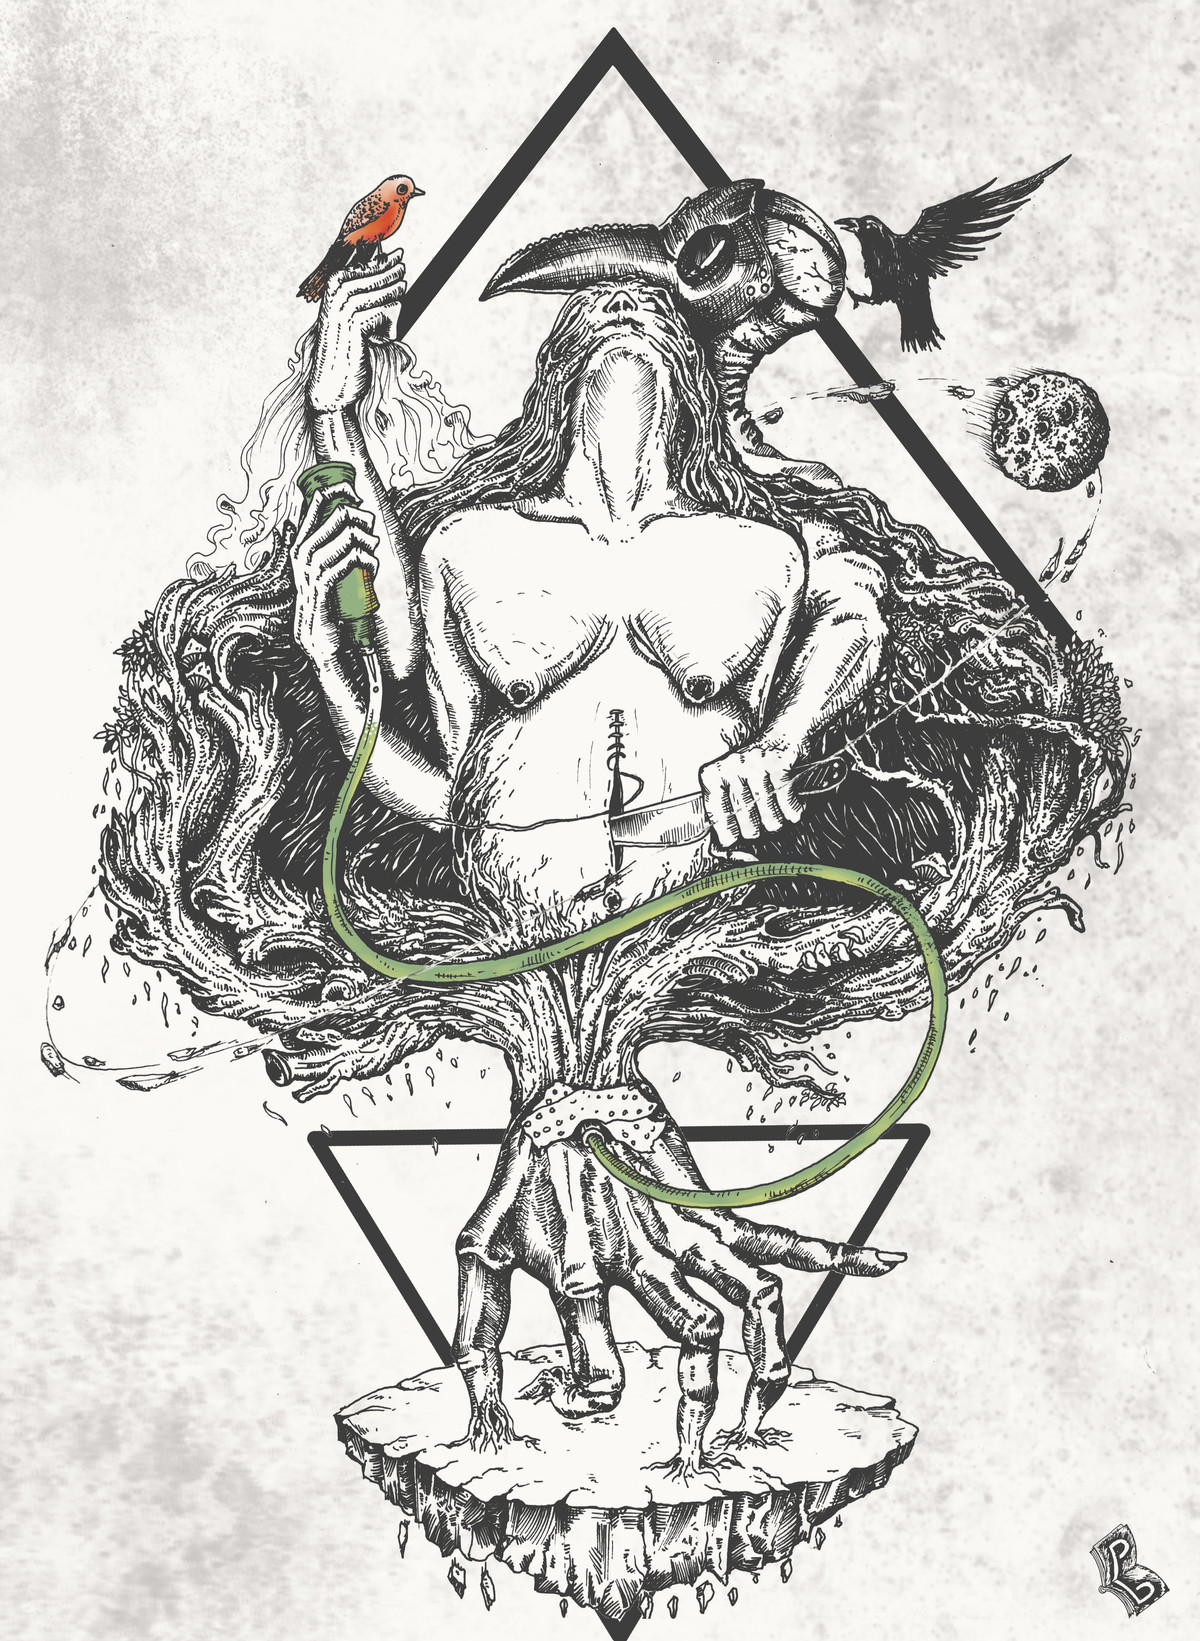 Rue by Pallab Baruah, Illustration Digital Art, Digital Print on Paper, Gray color